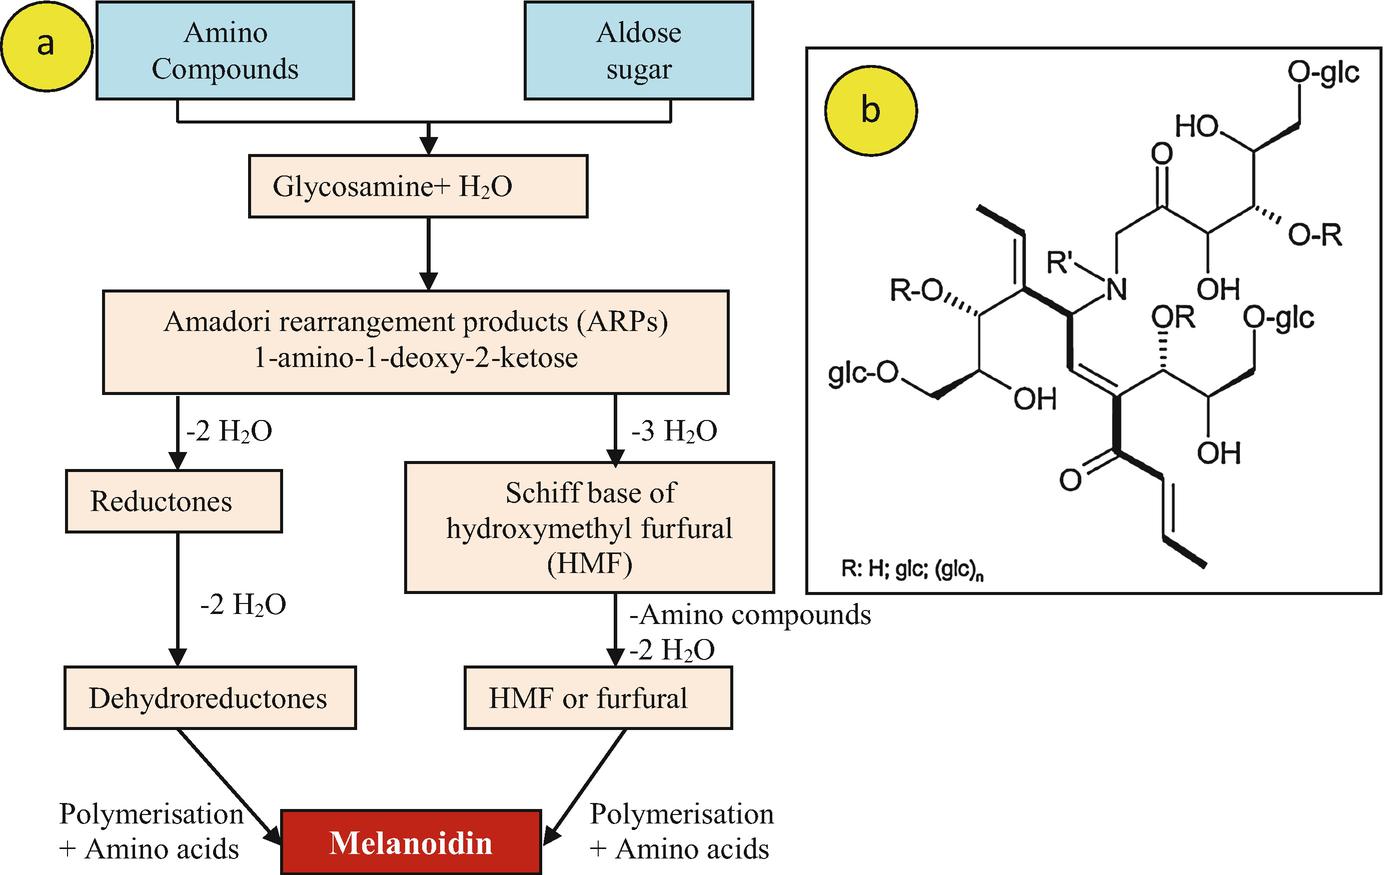 Bioremediation of Melanoidins Containing Distillery Waste for